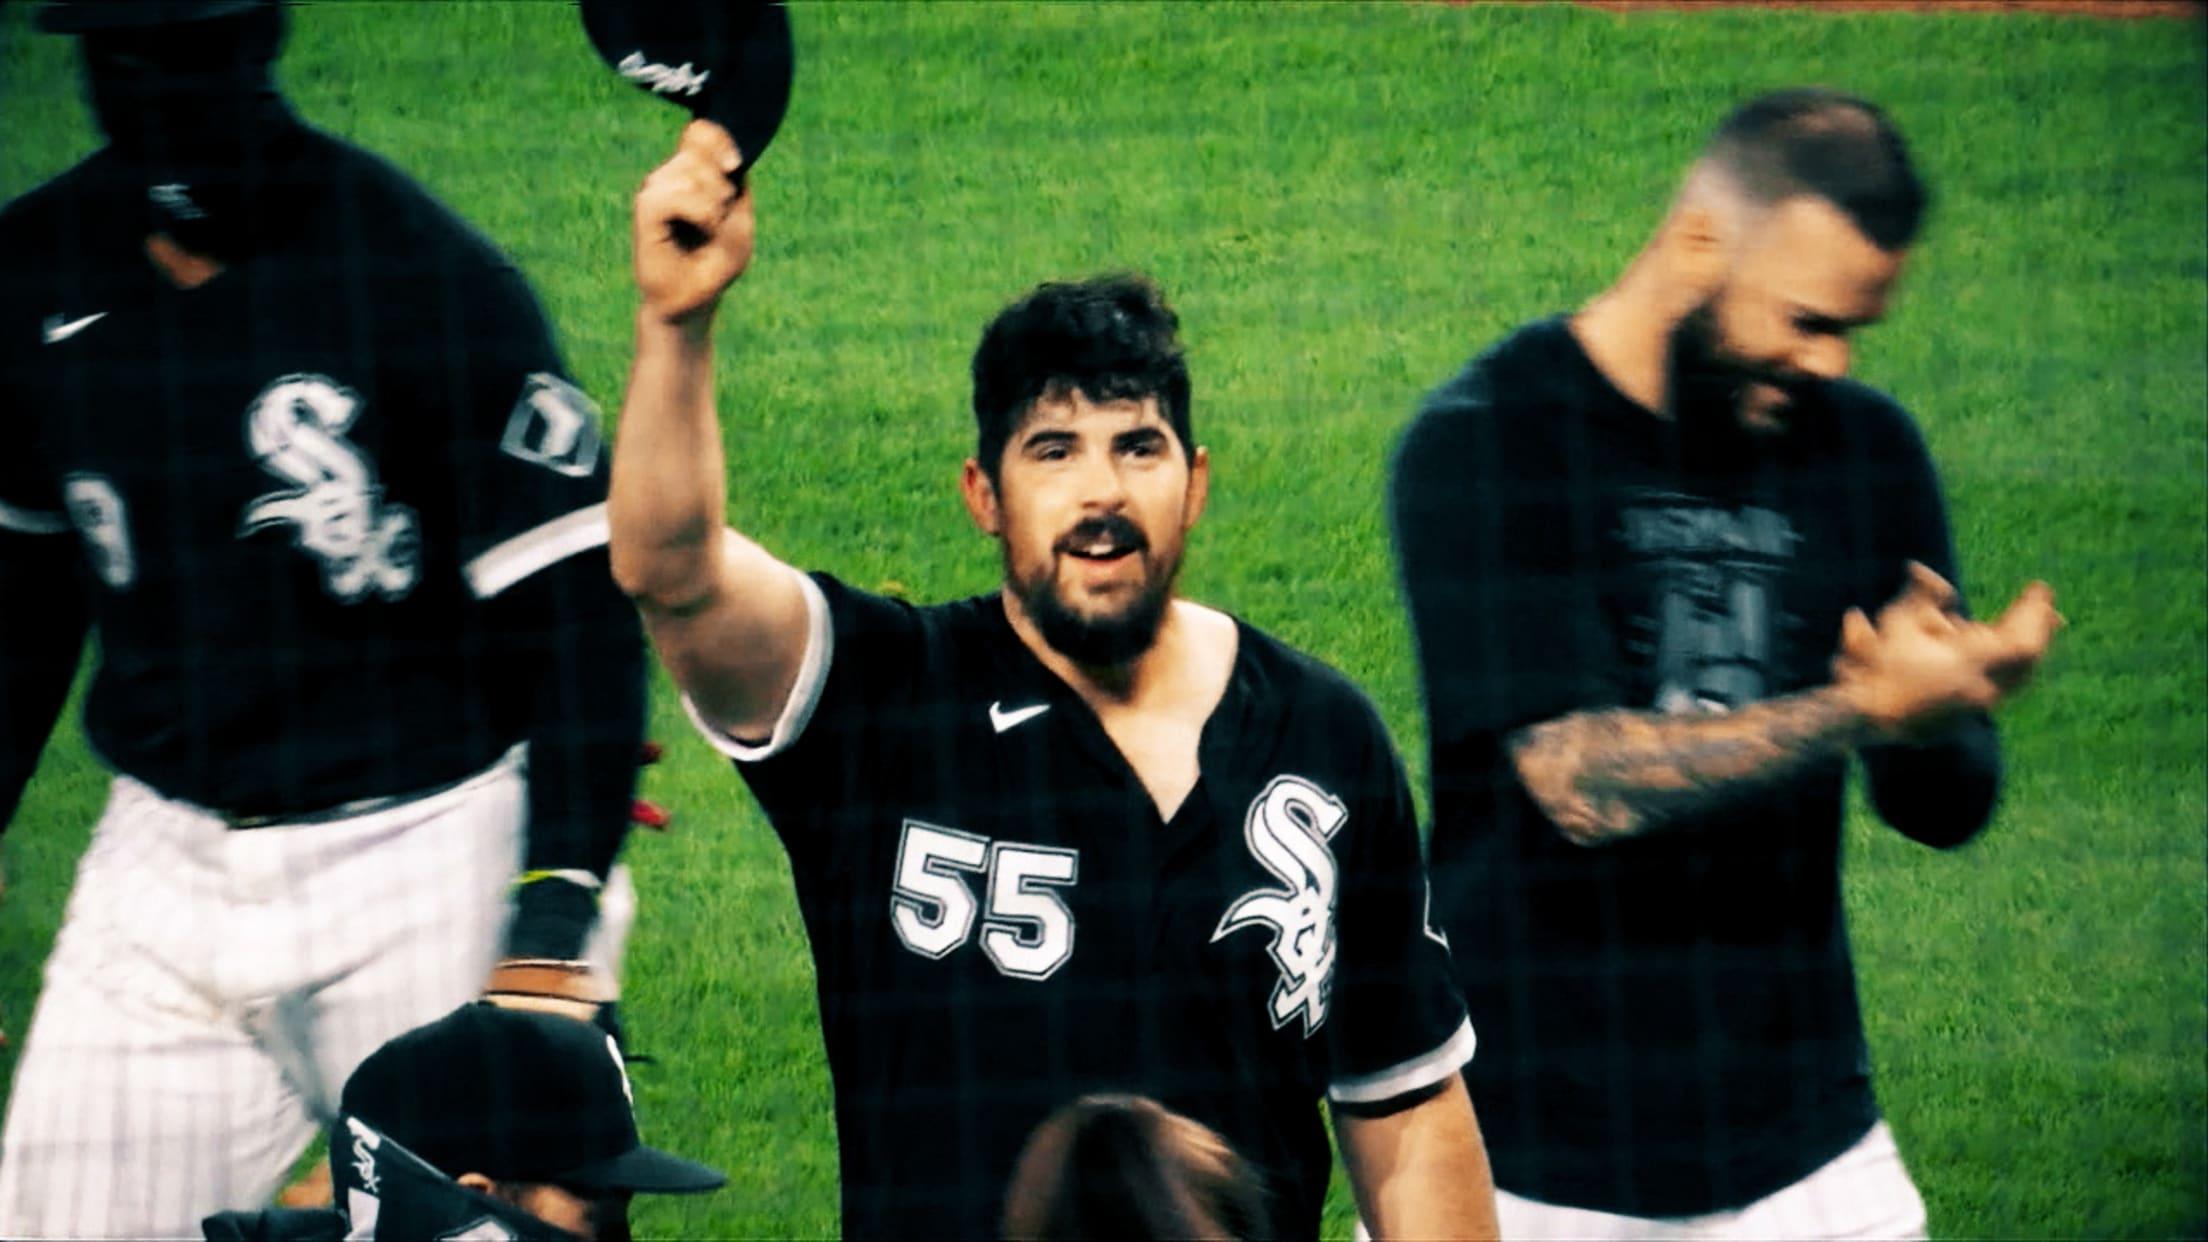 【MLB】第3週 ア・リーグ週間MVPはホワイトソックスのカルロス・ロドン 4.20